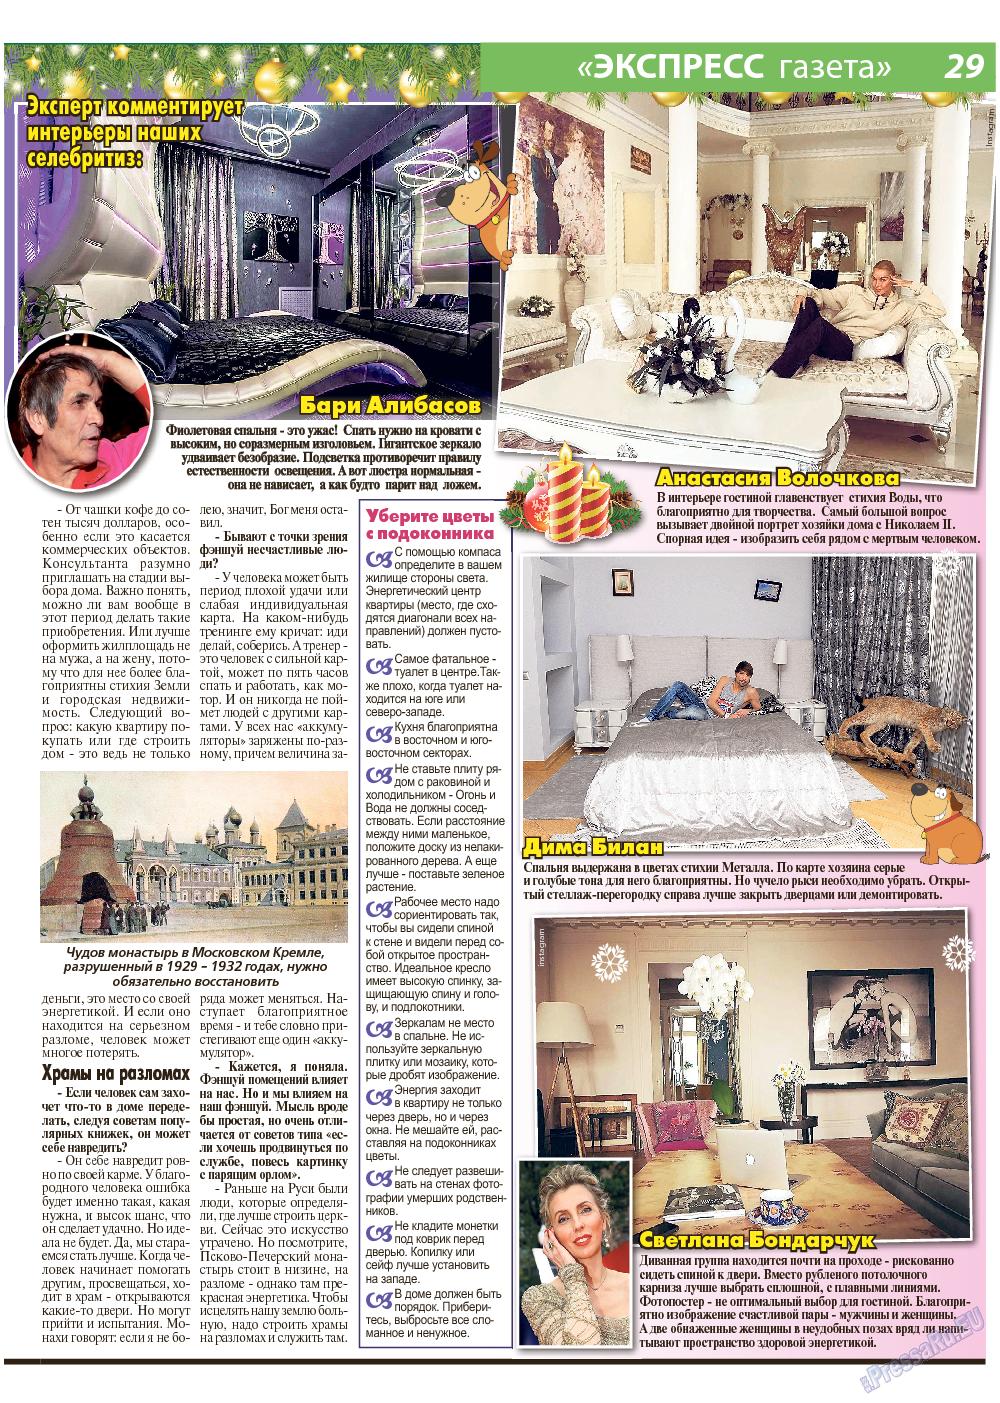 Экспресс газета (газета). 2018 год, номер 2, стр. 29